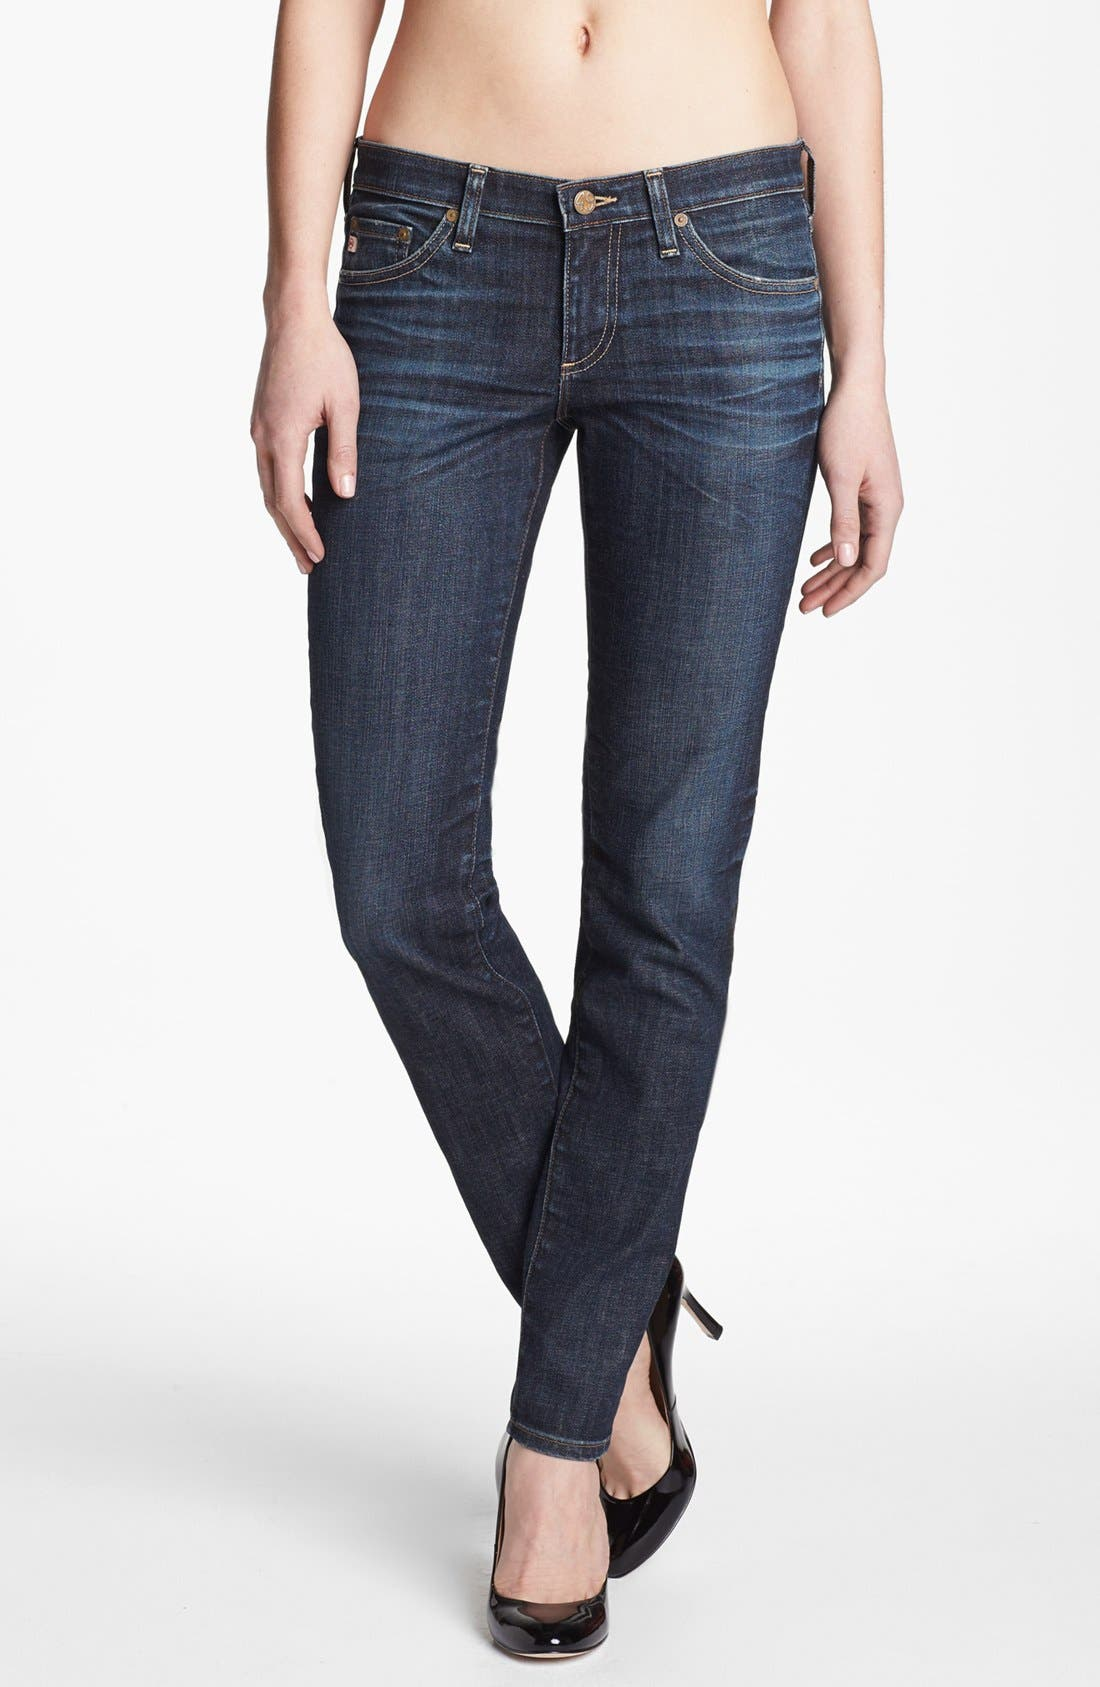 Main Image - AG 'The Stilt' Cigarette Leg Stretch Jeans (4 Year Coastline)